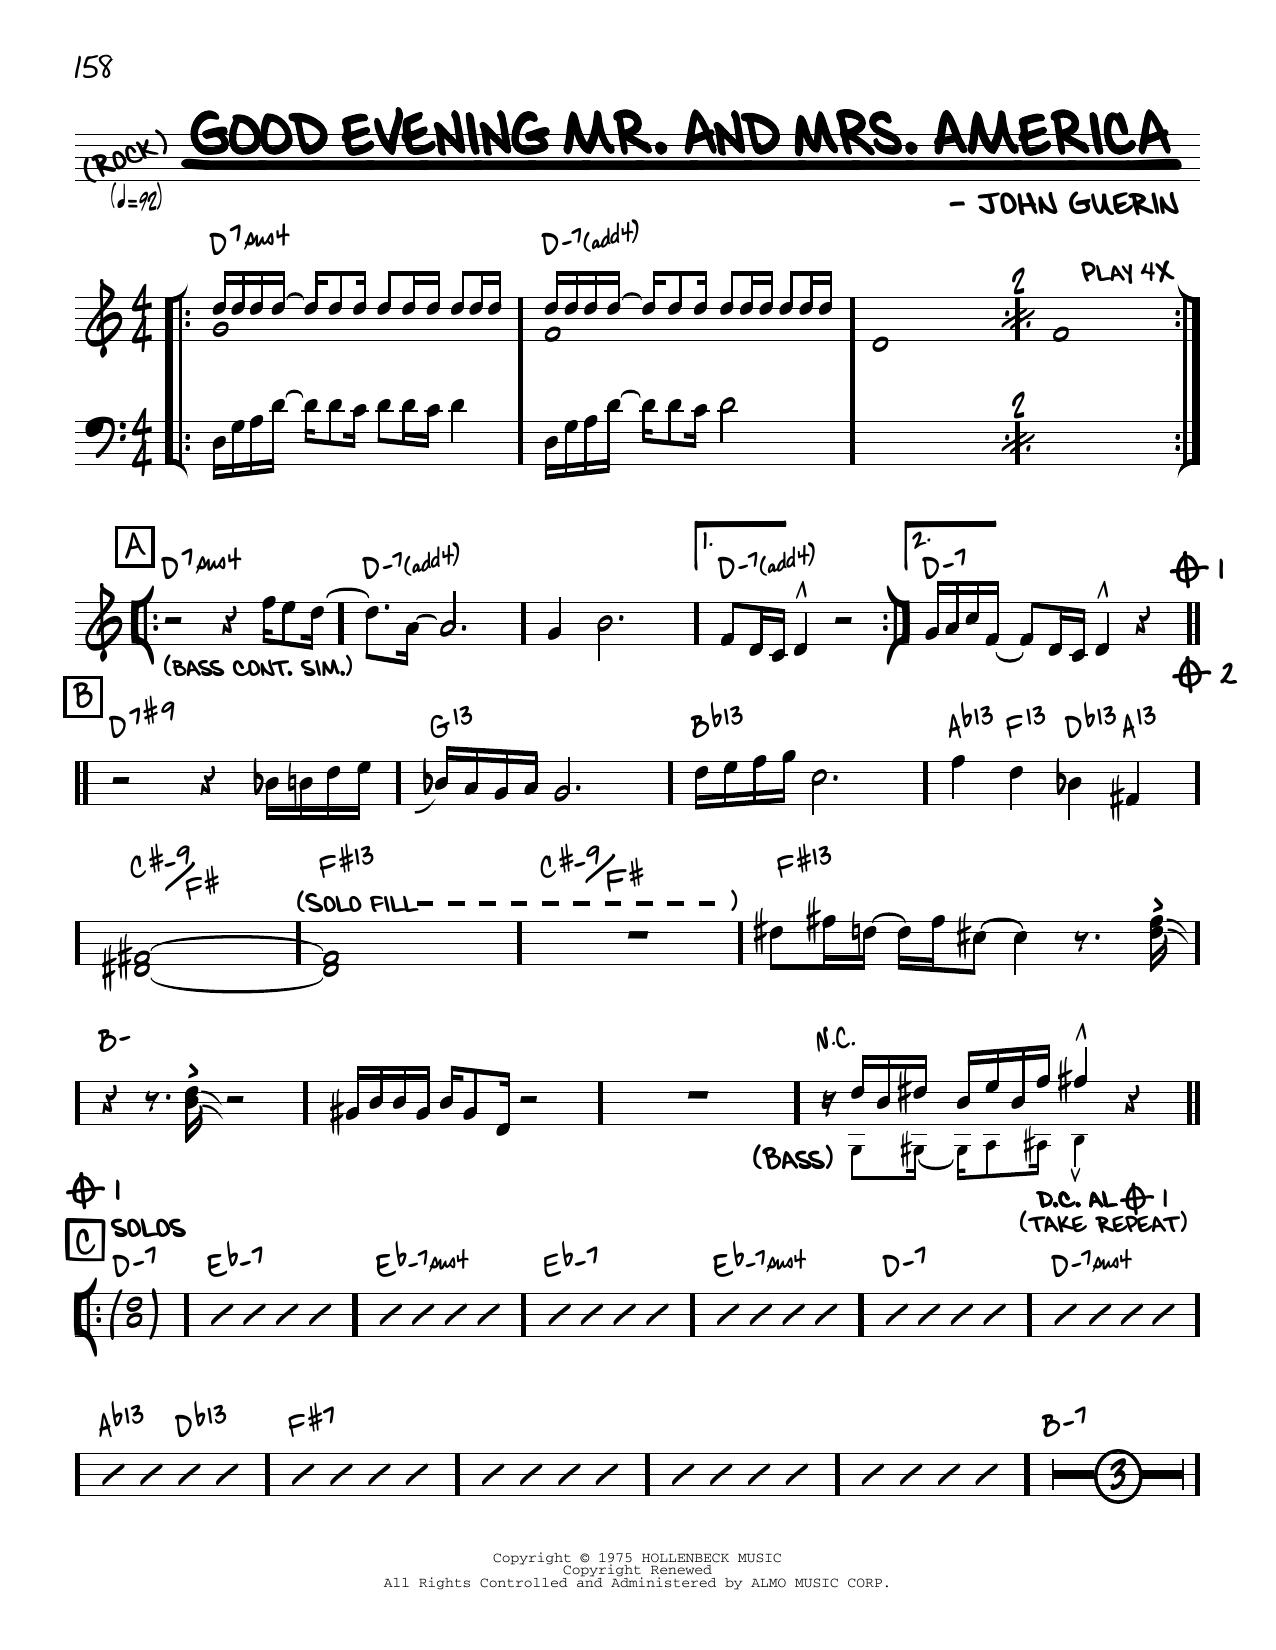 John Guerin Good Evening Mr. And Mrs. America [Reharmonized version] (arr. Jack Grassel) sheet music notes printable PDF score